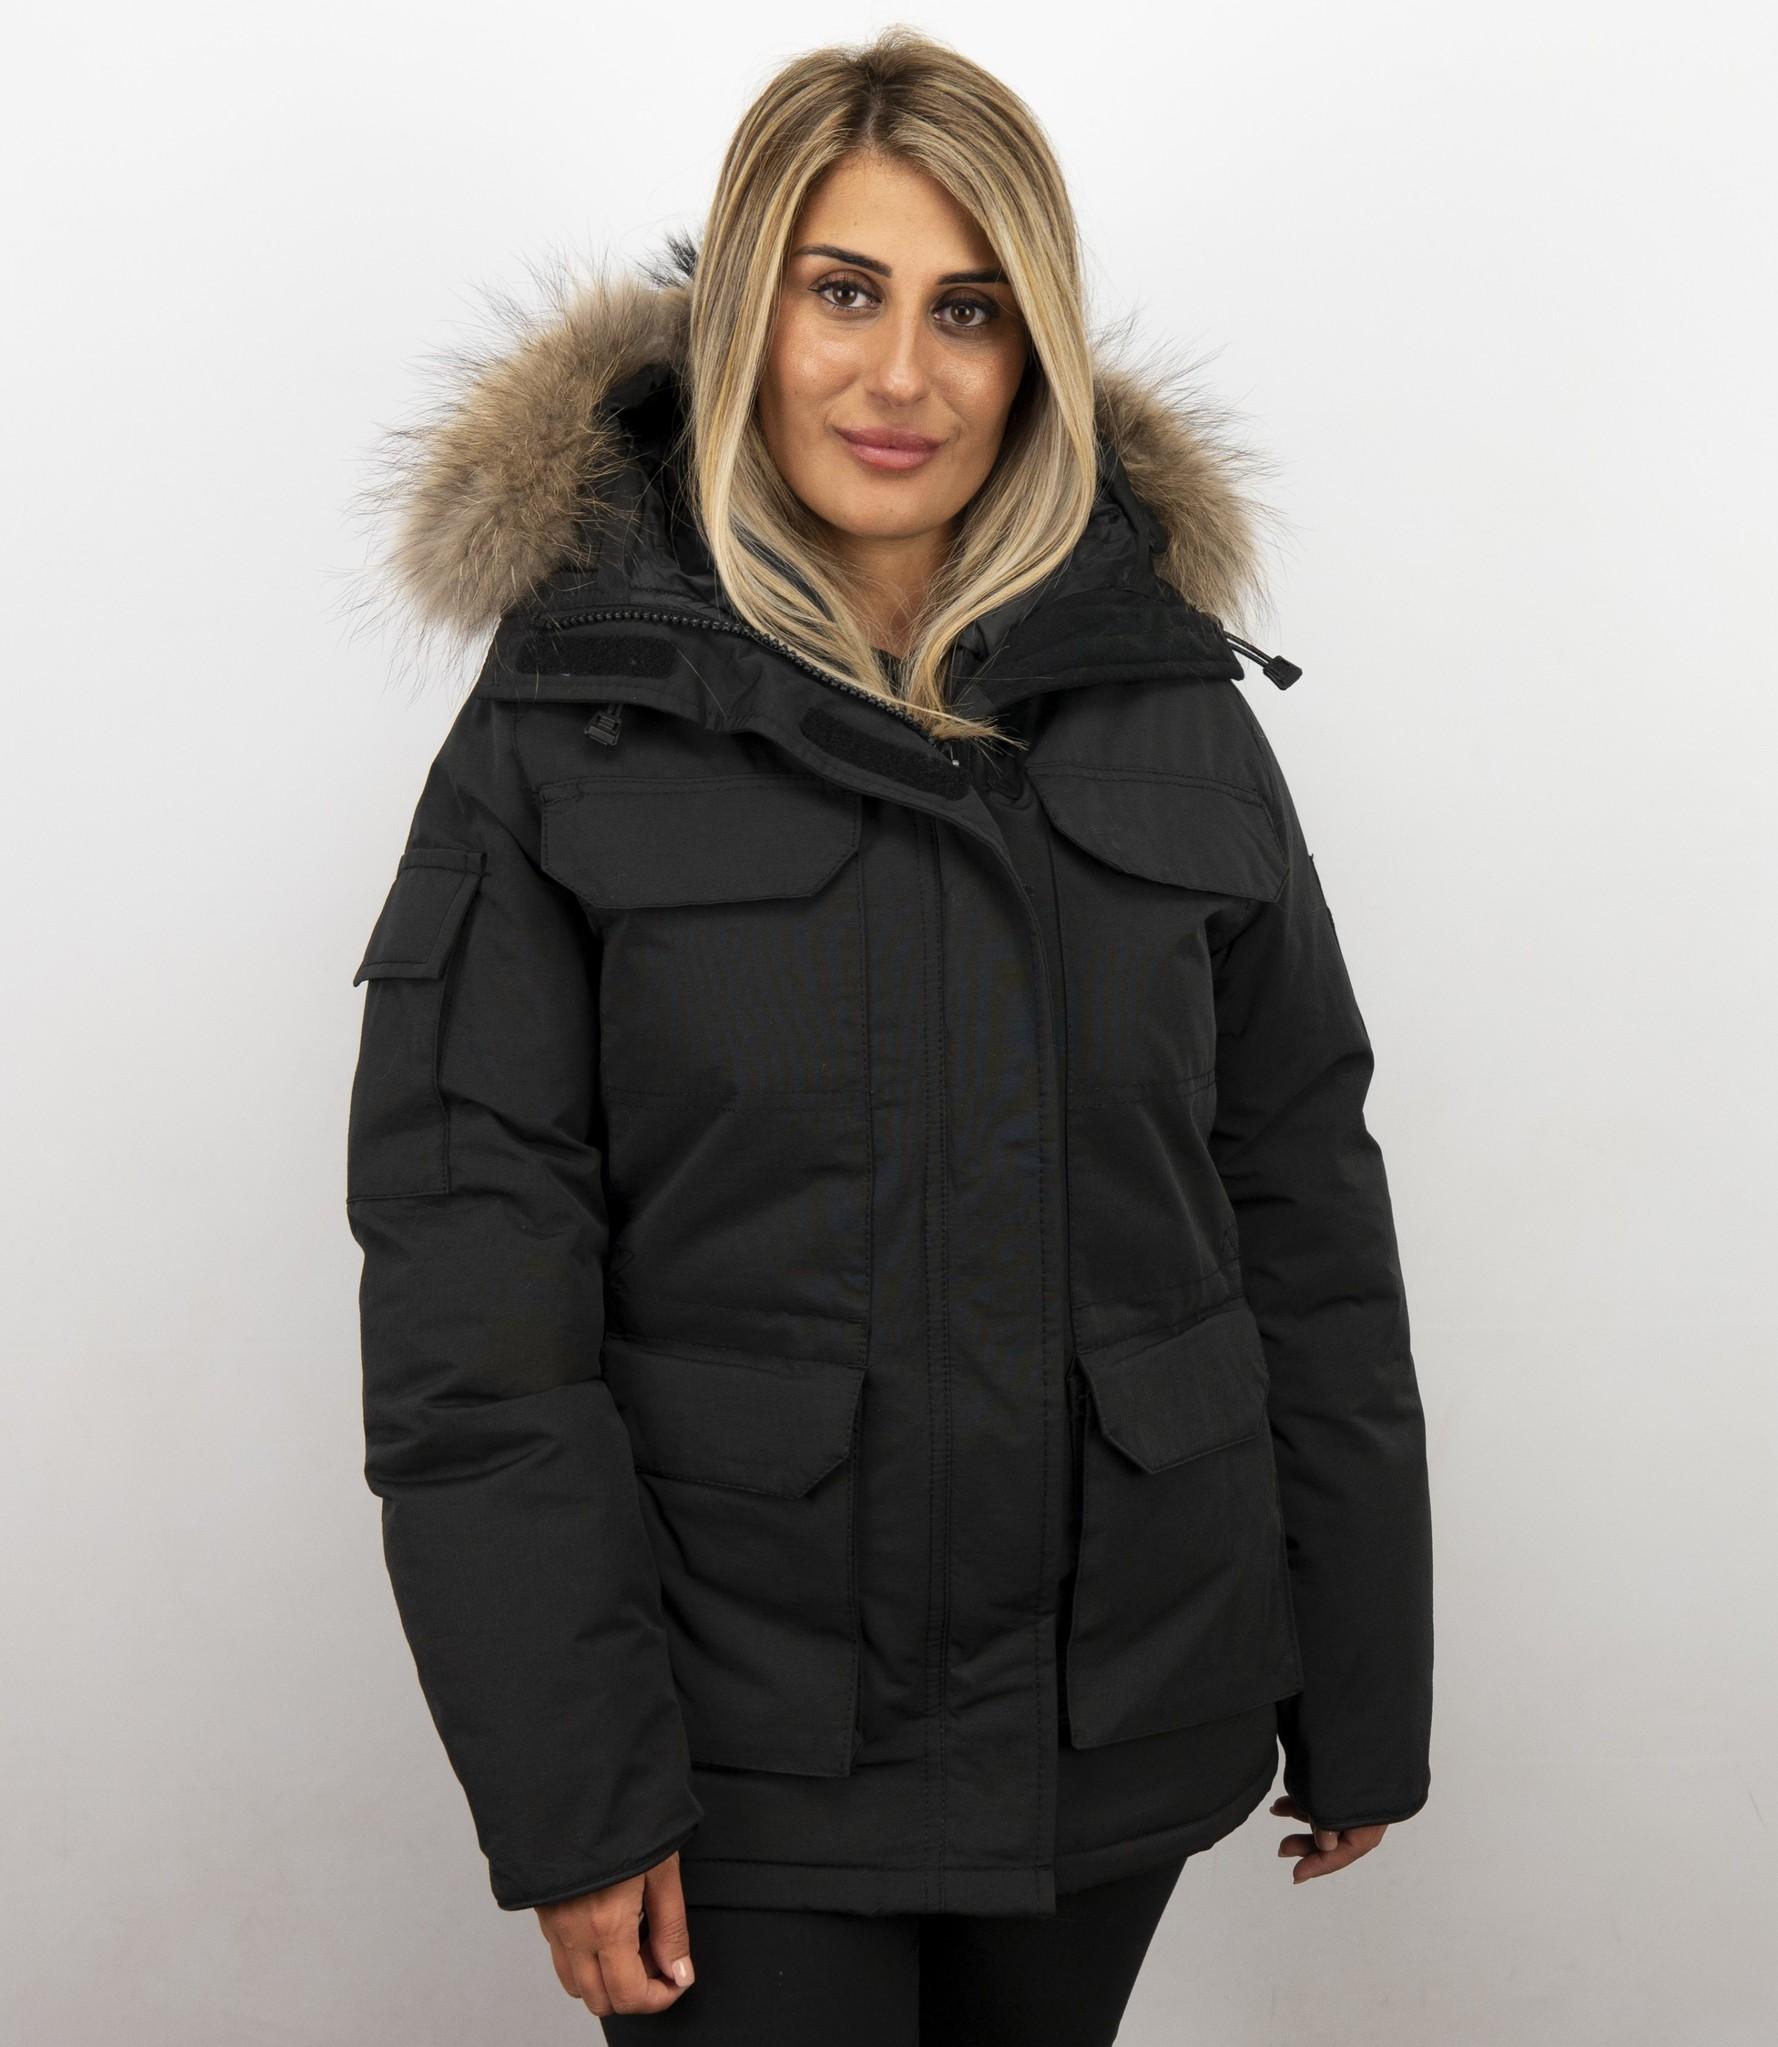 Matogla Jacken mit Fellkragen - Winterjacken Damen Lange ...